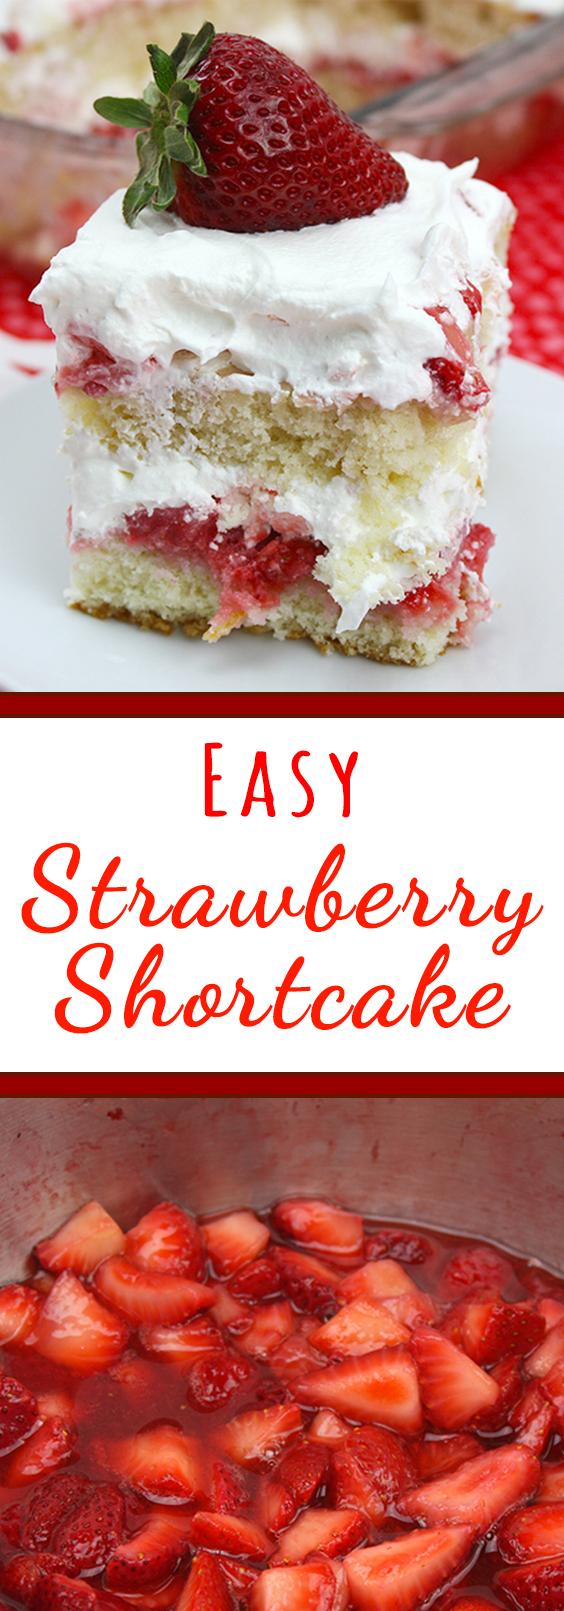 Easy Strawberry Shortbread Recipe